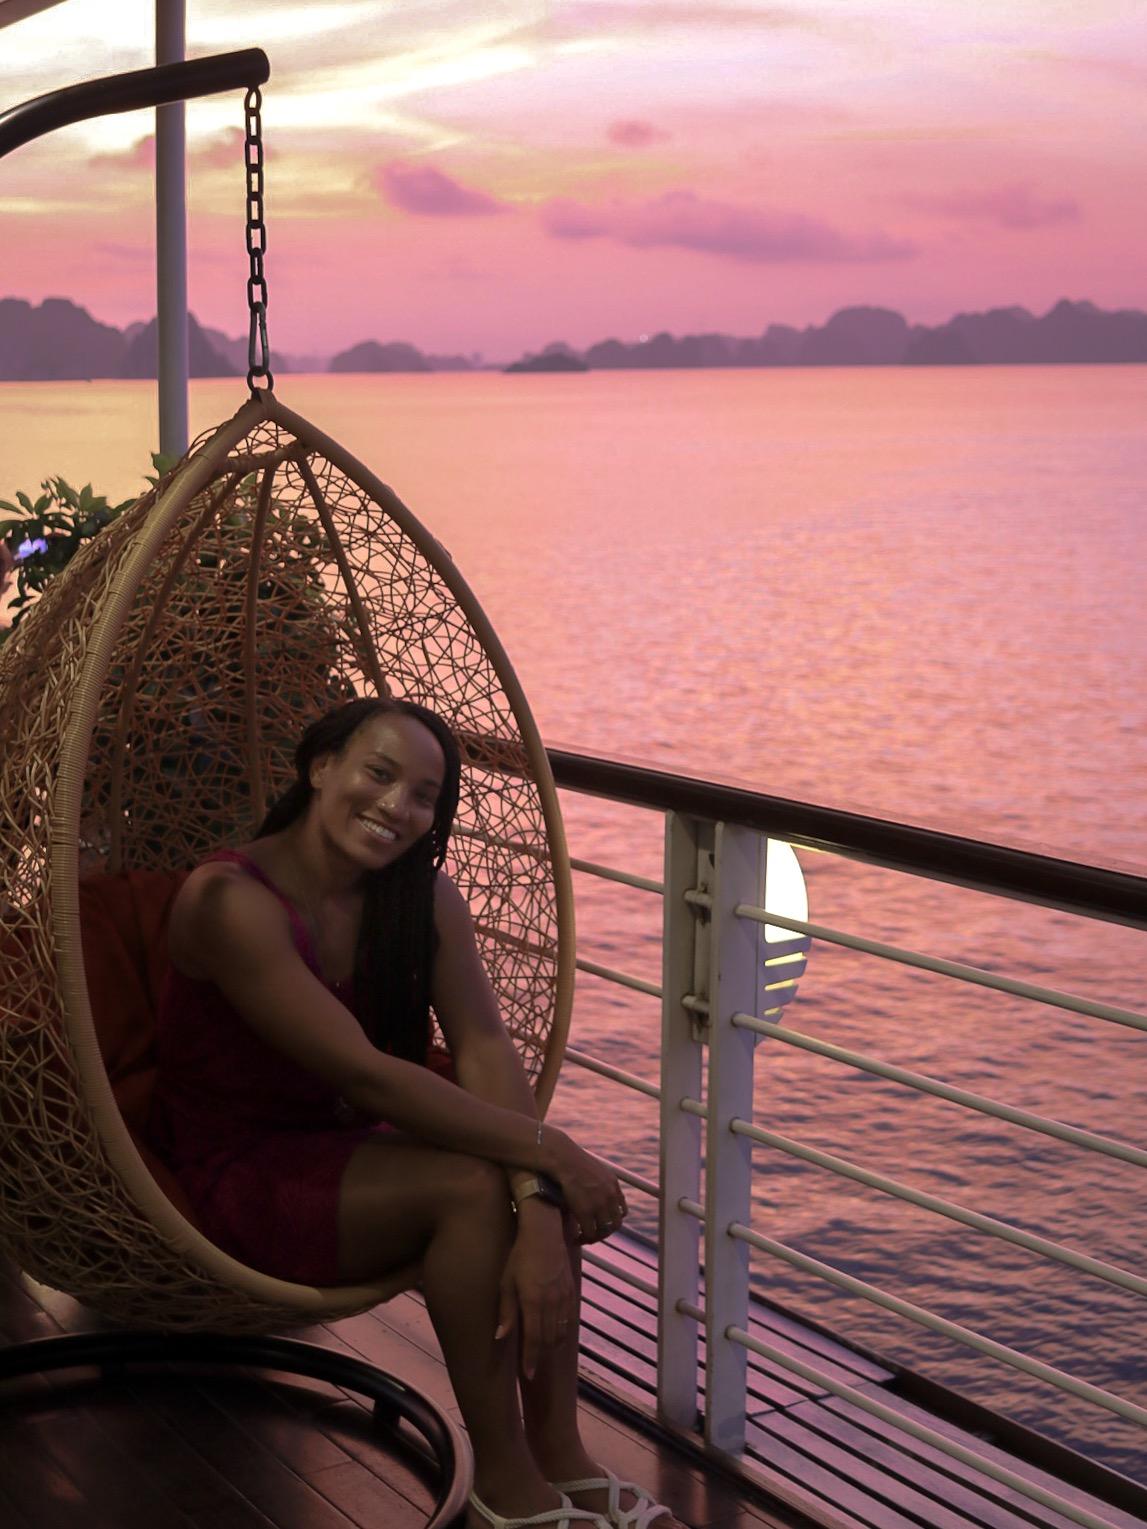 Illustrated by Sade - Sunset while cruising Ha Long Bay, Vietnam